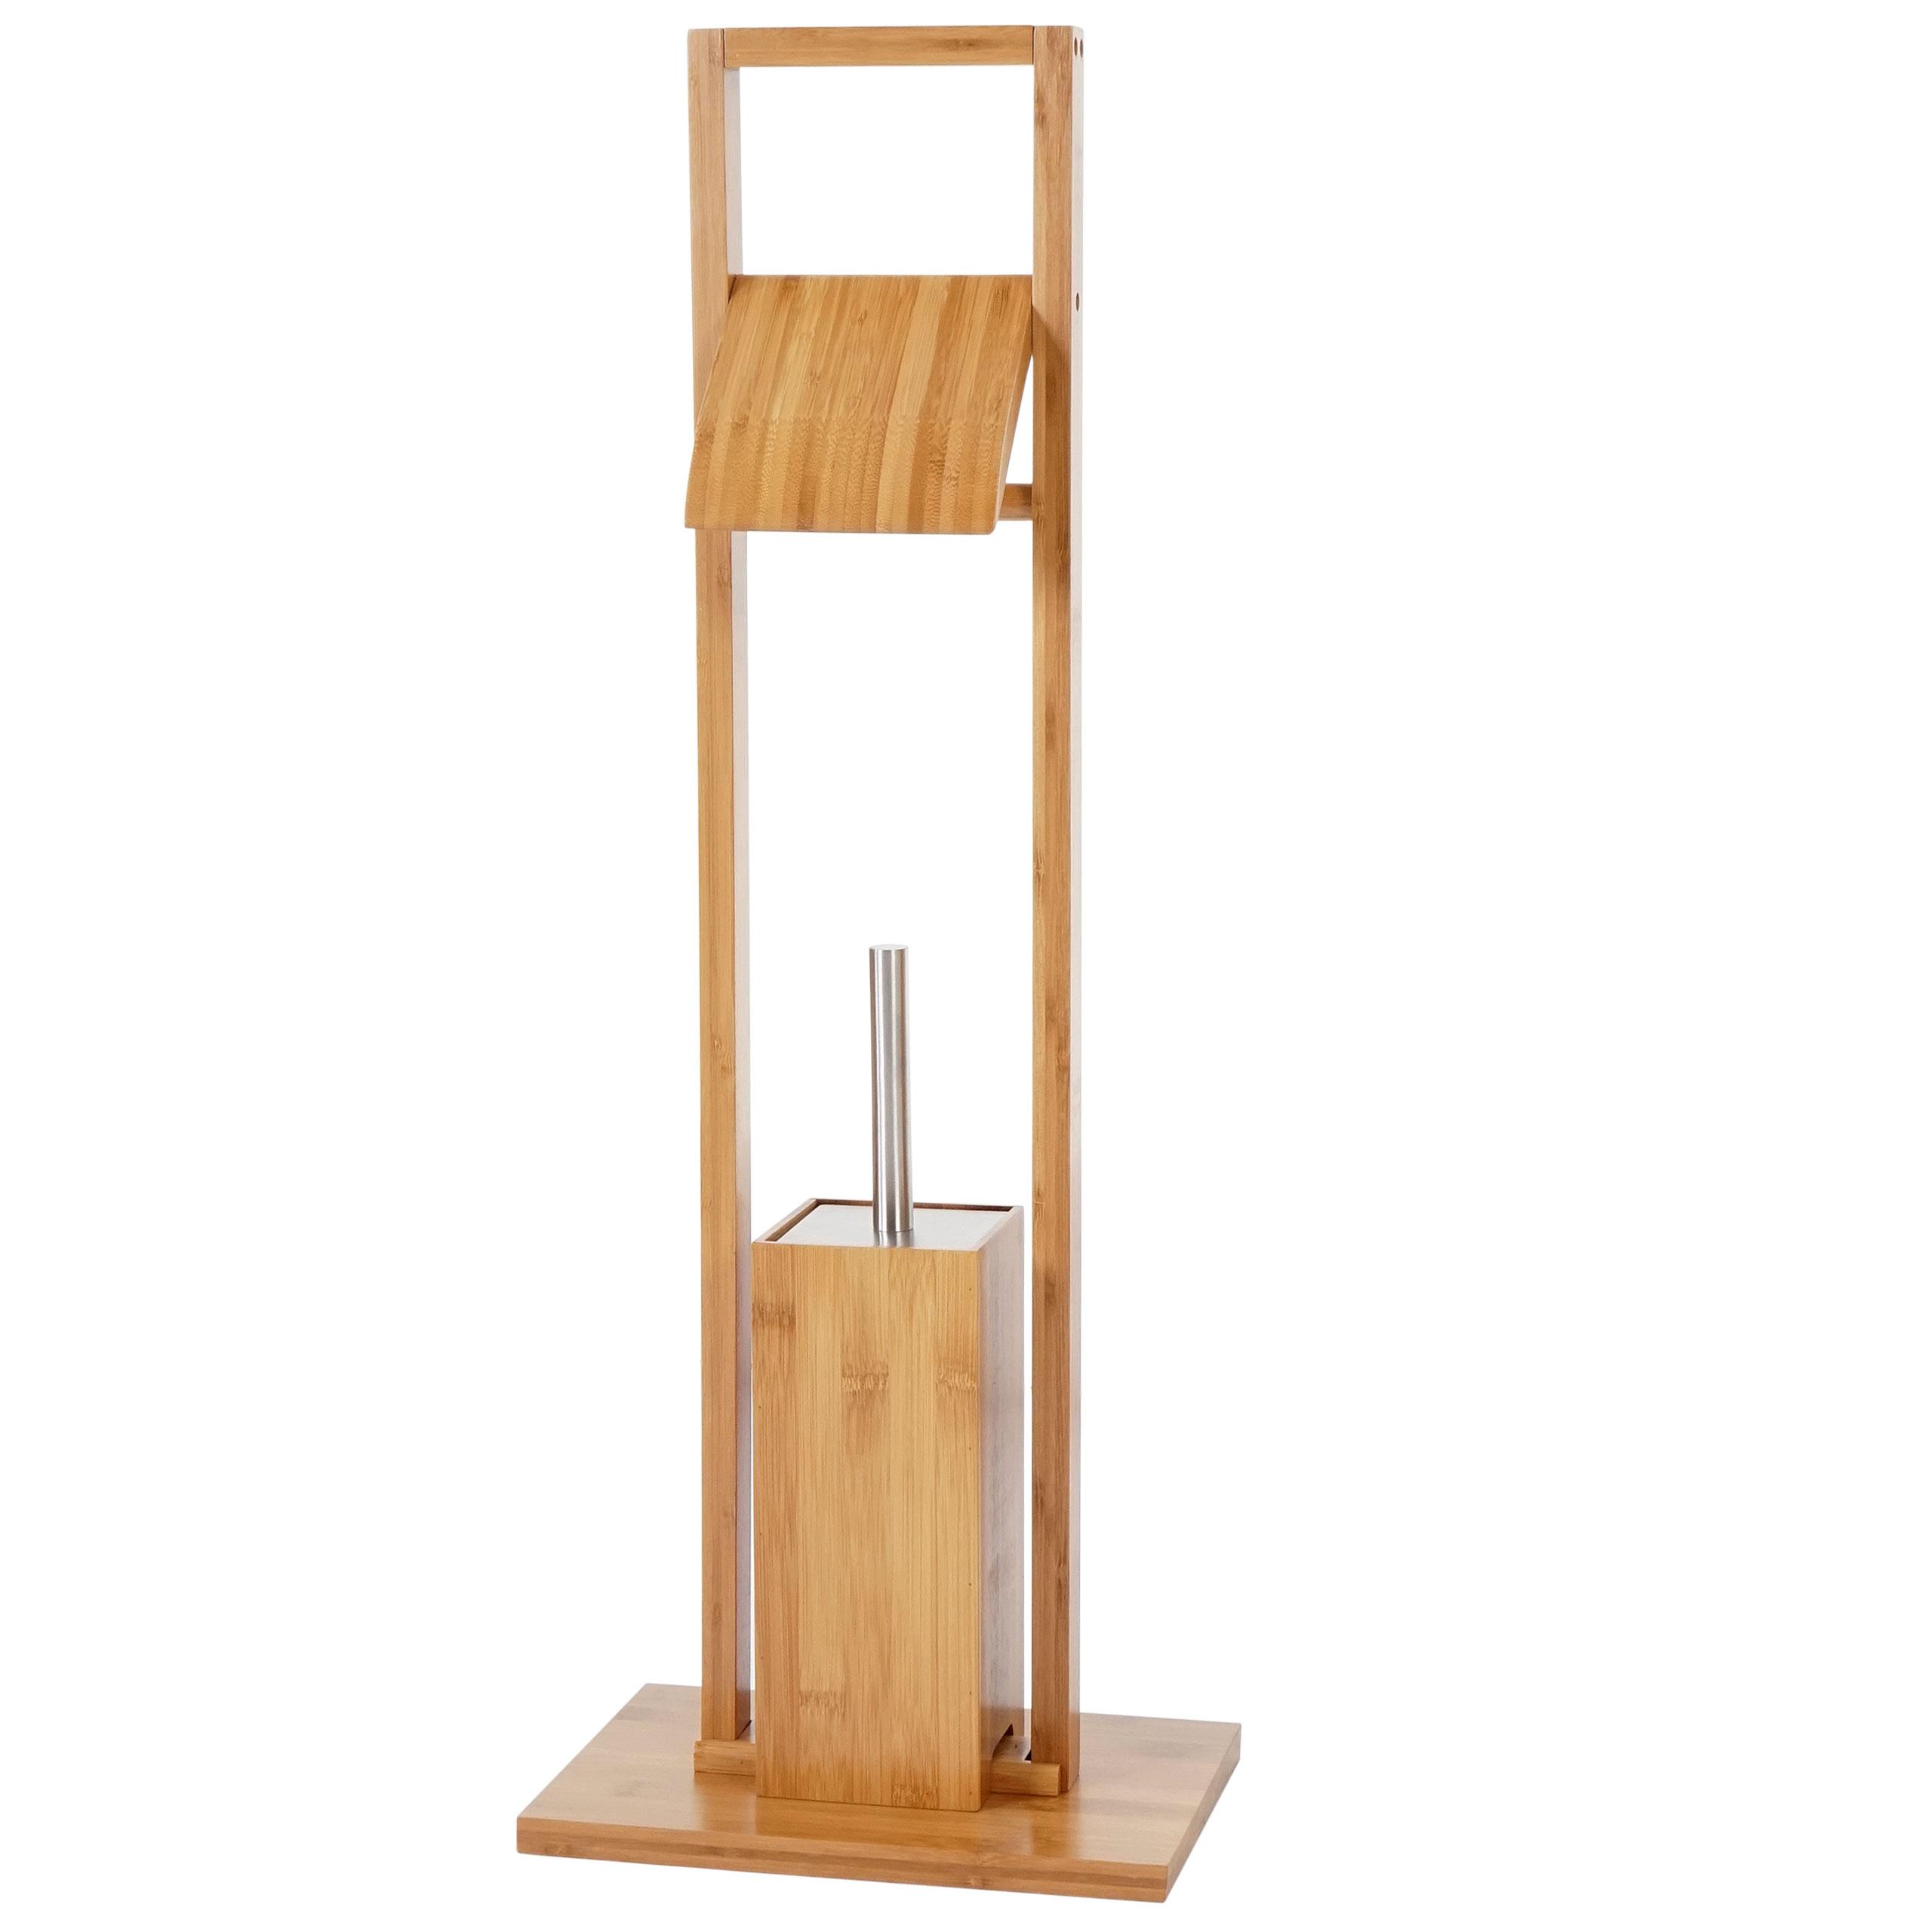 wc papierhalter klopapierhalter toilettenrollenhalter. Black Bedroom Furniture Sets. Home Design Ideas